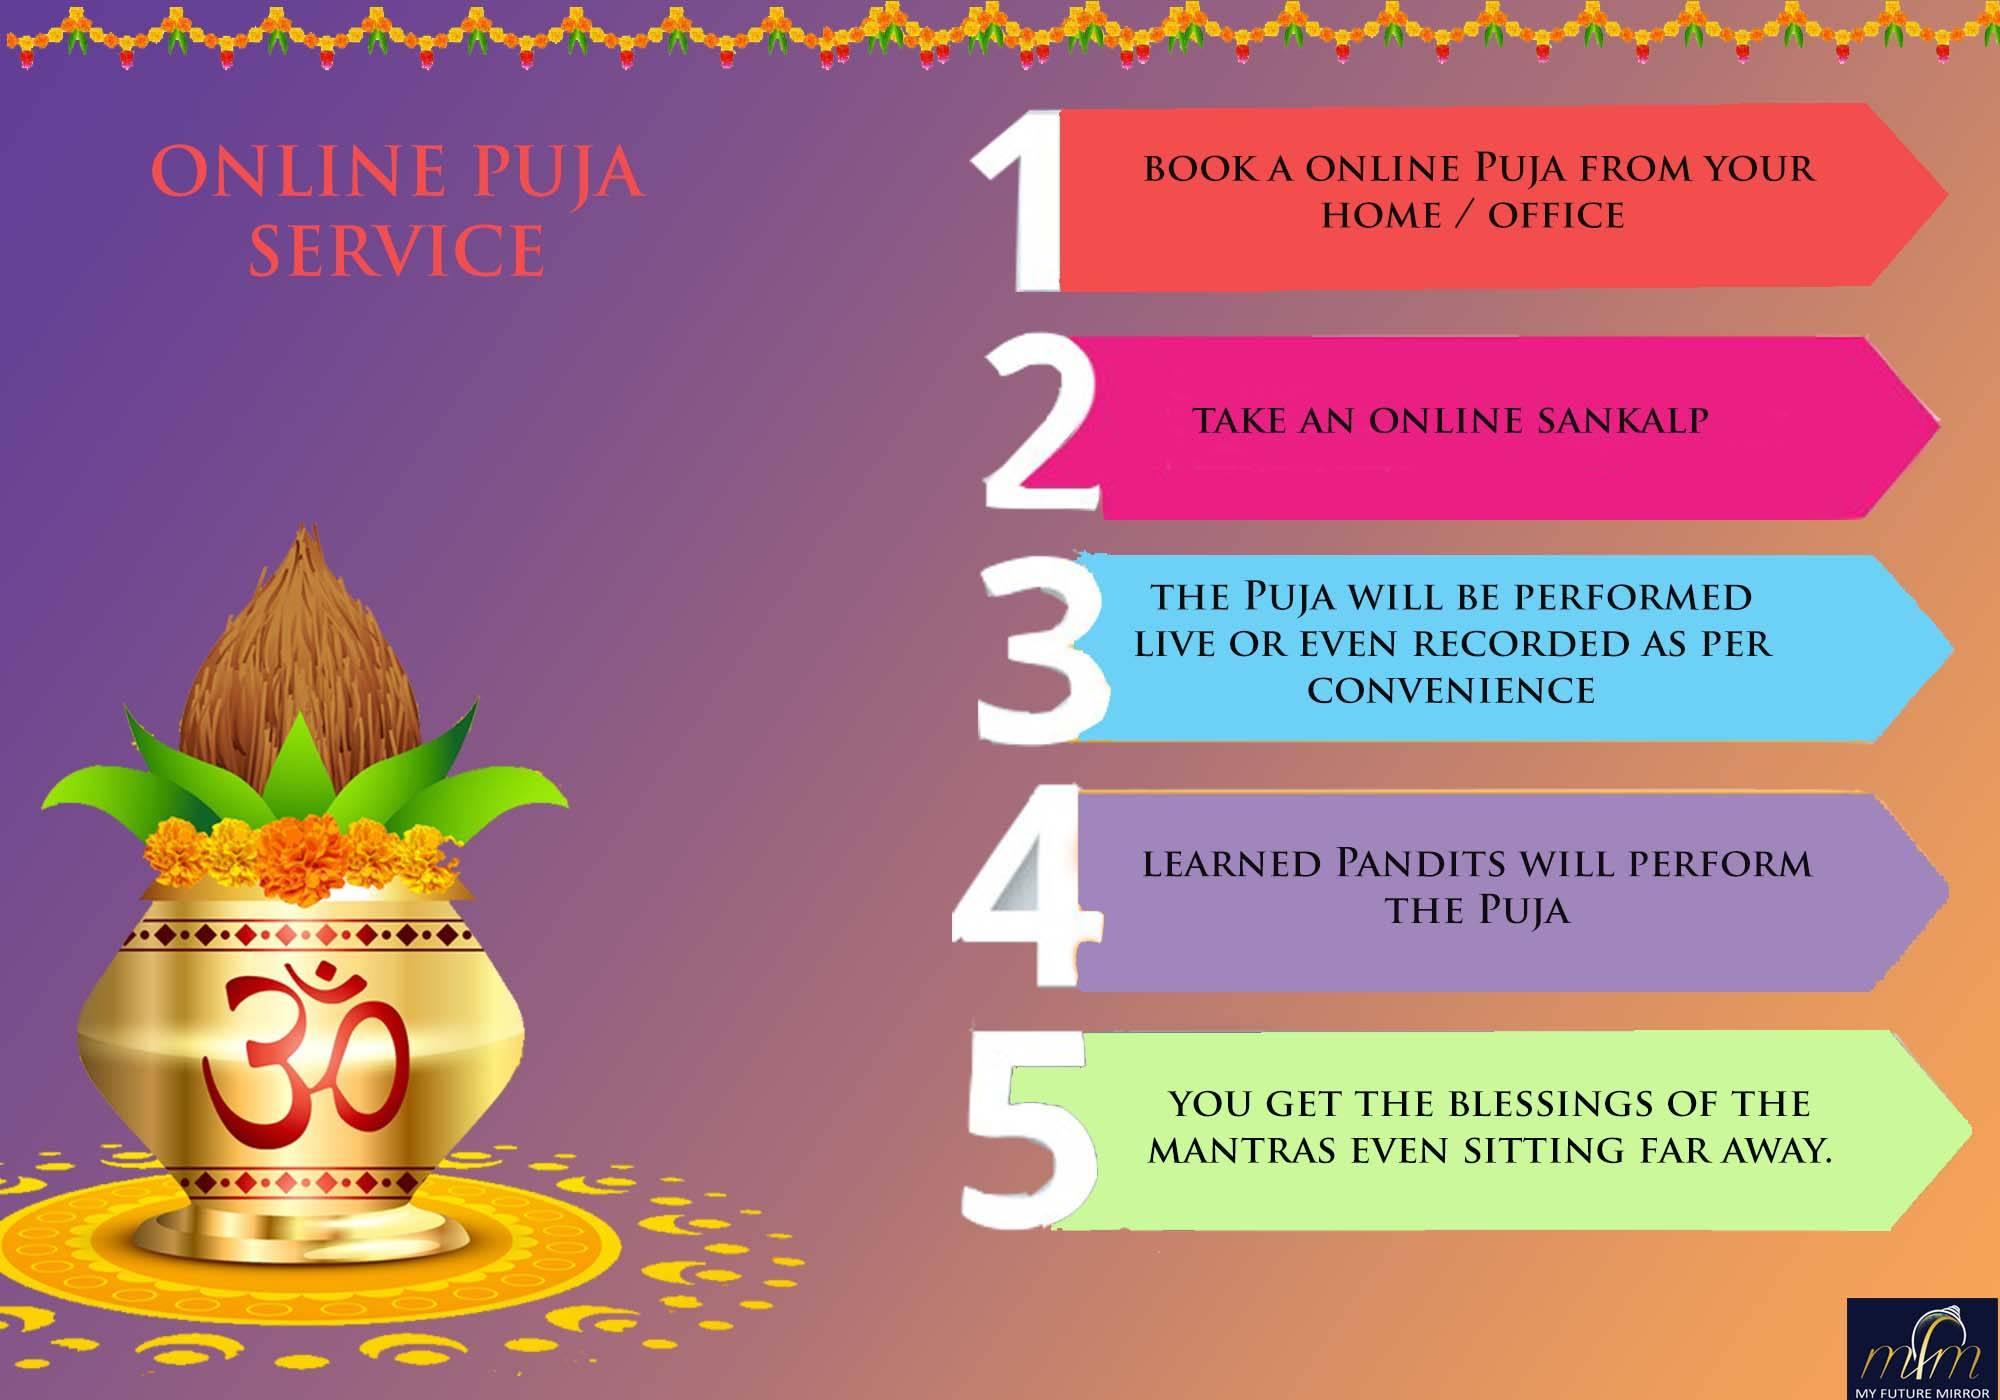 Benefit of Vedic astrology & puja - LetsDiskuss